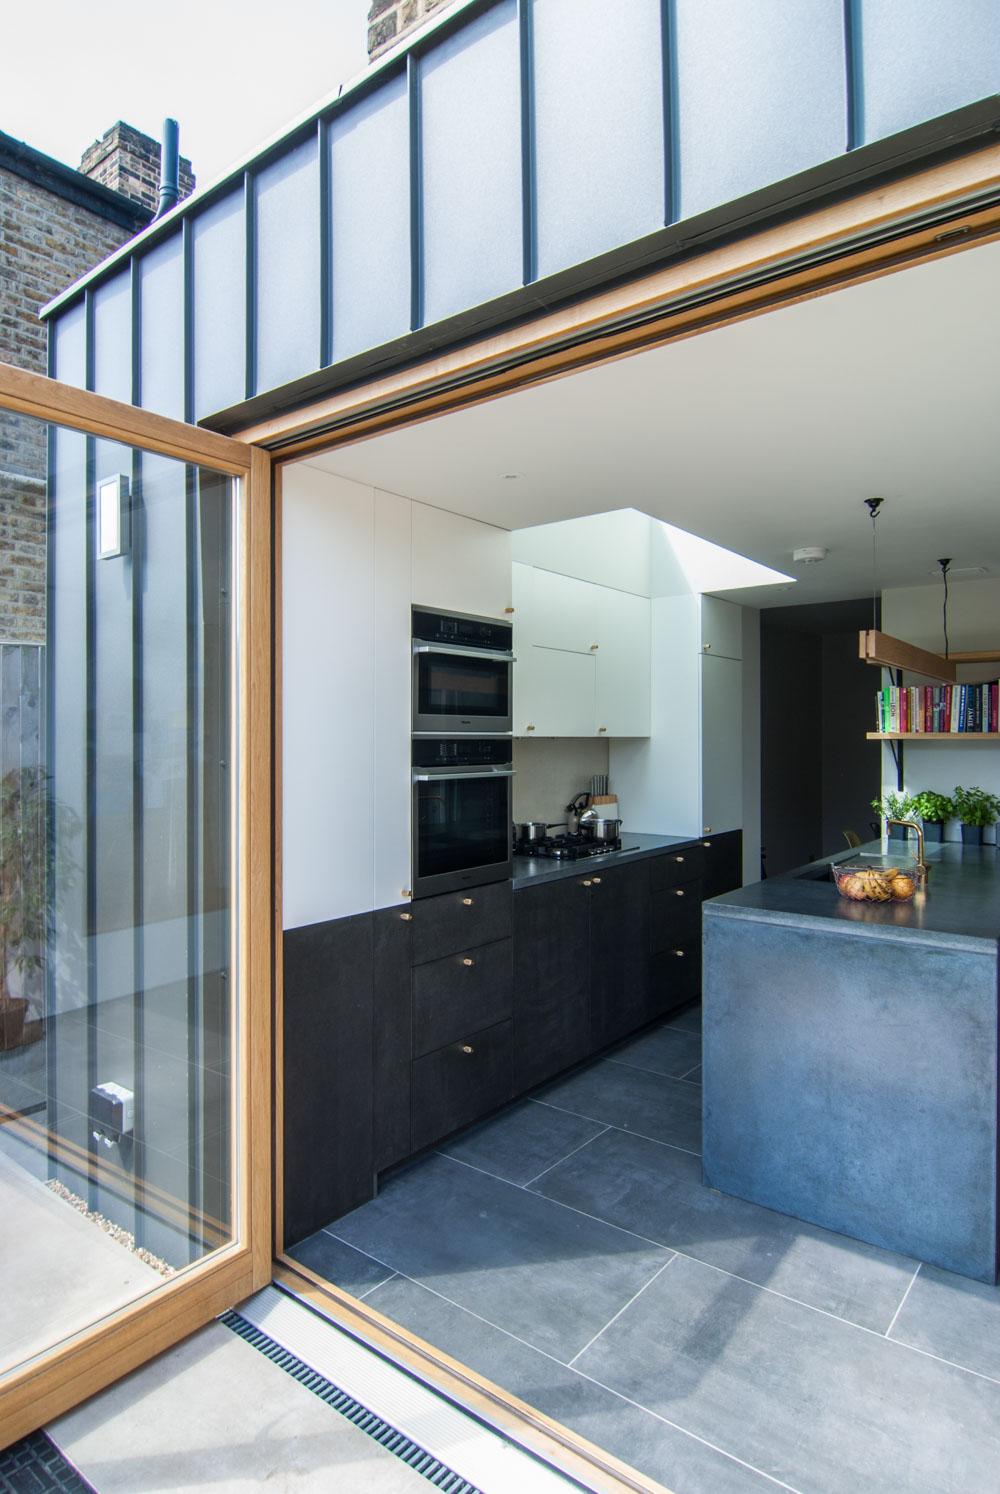 standing seam zinc cladding black concreto strata tile mortise concrete worktop MDF Bespoke oak bi-fold door